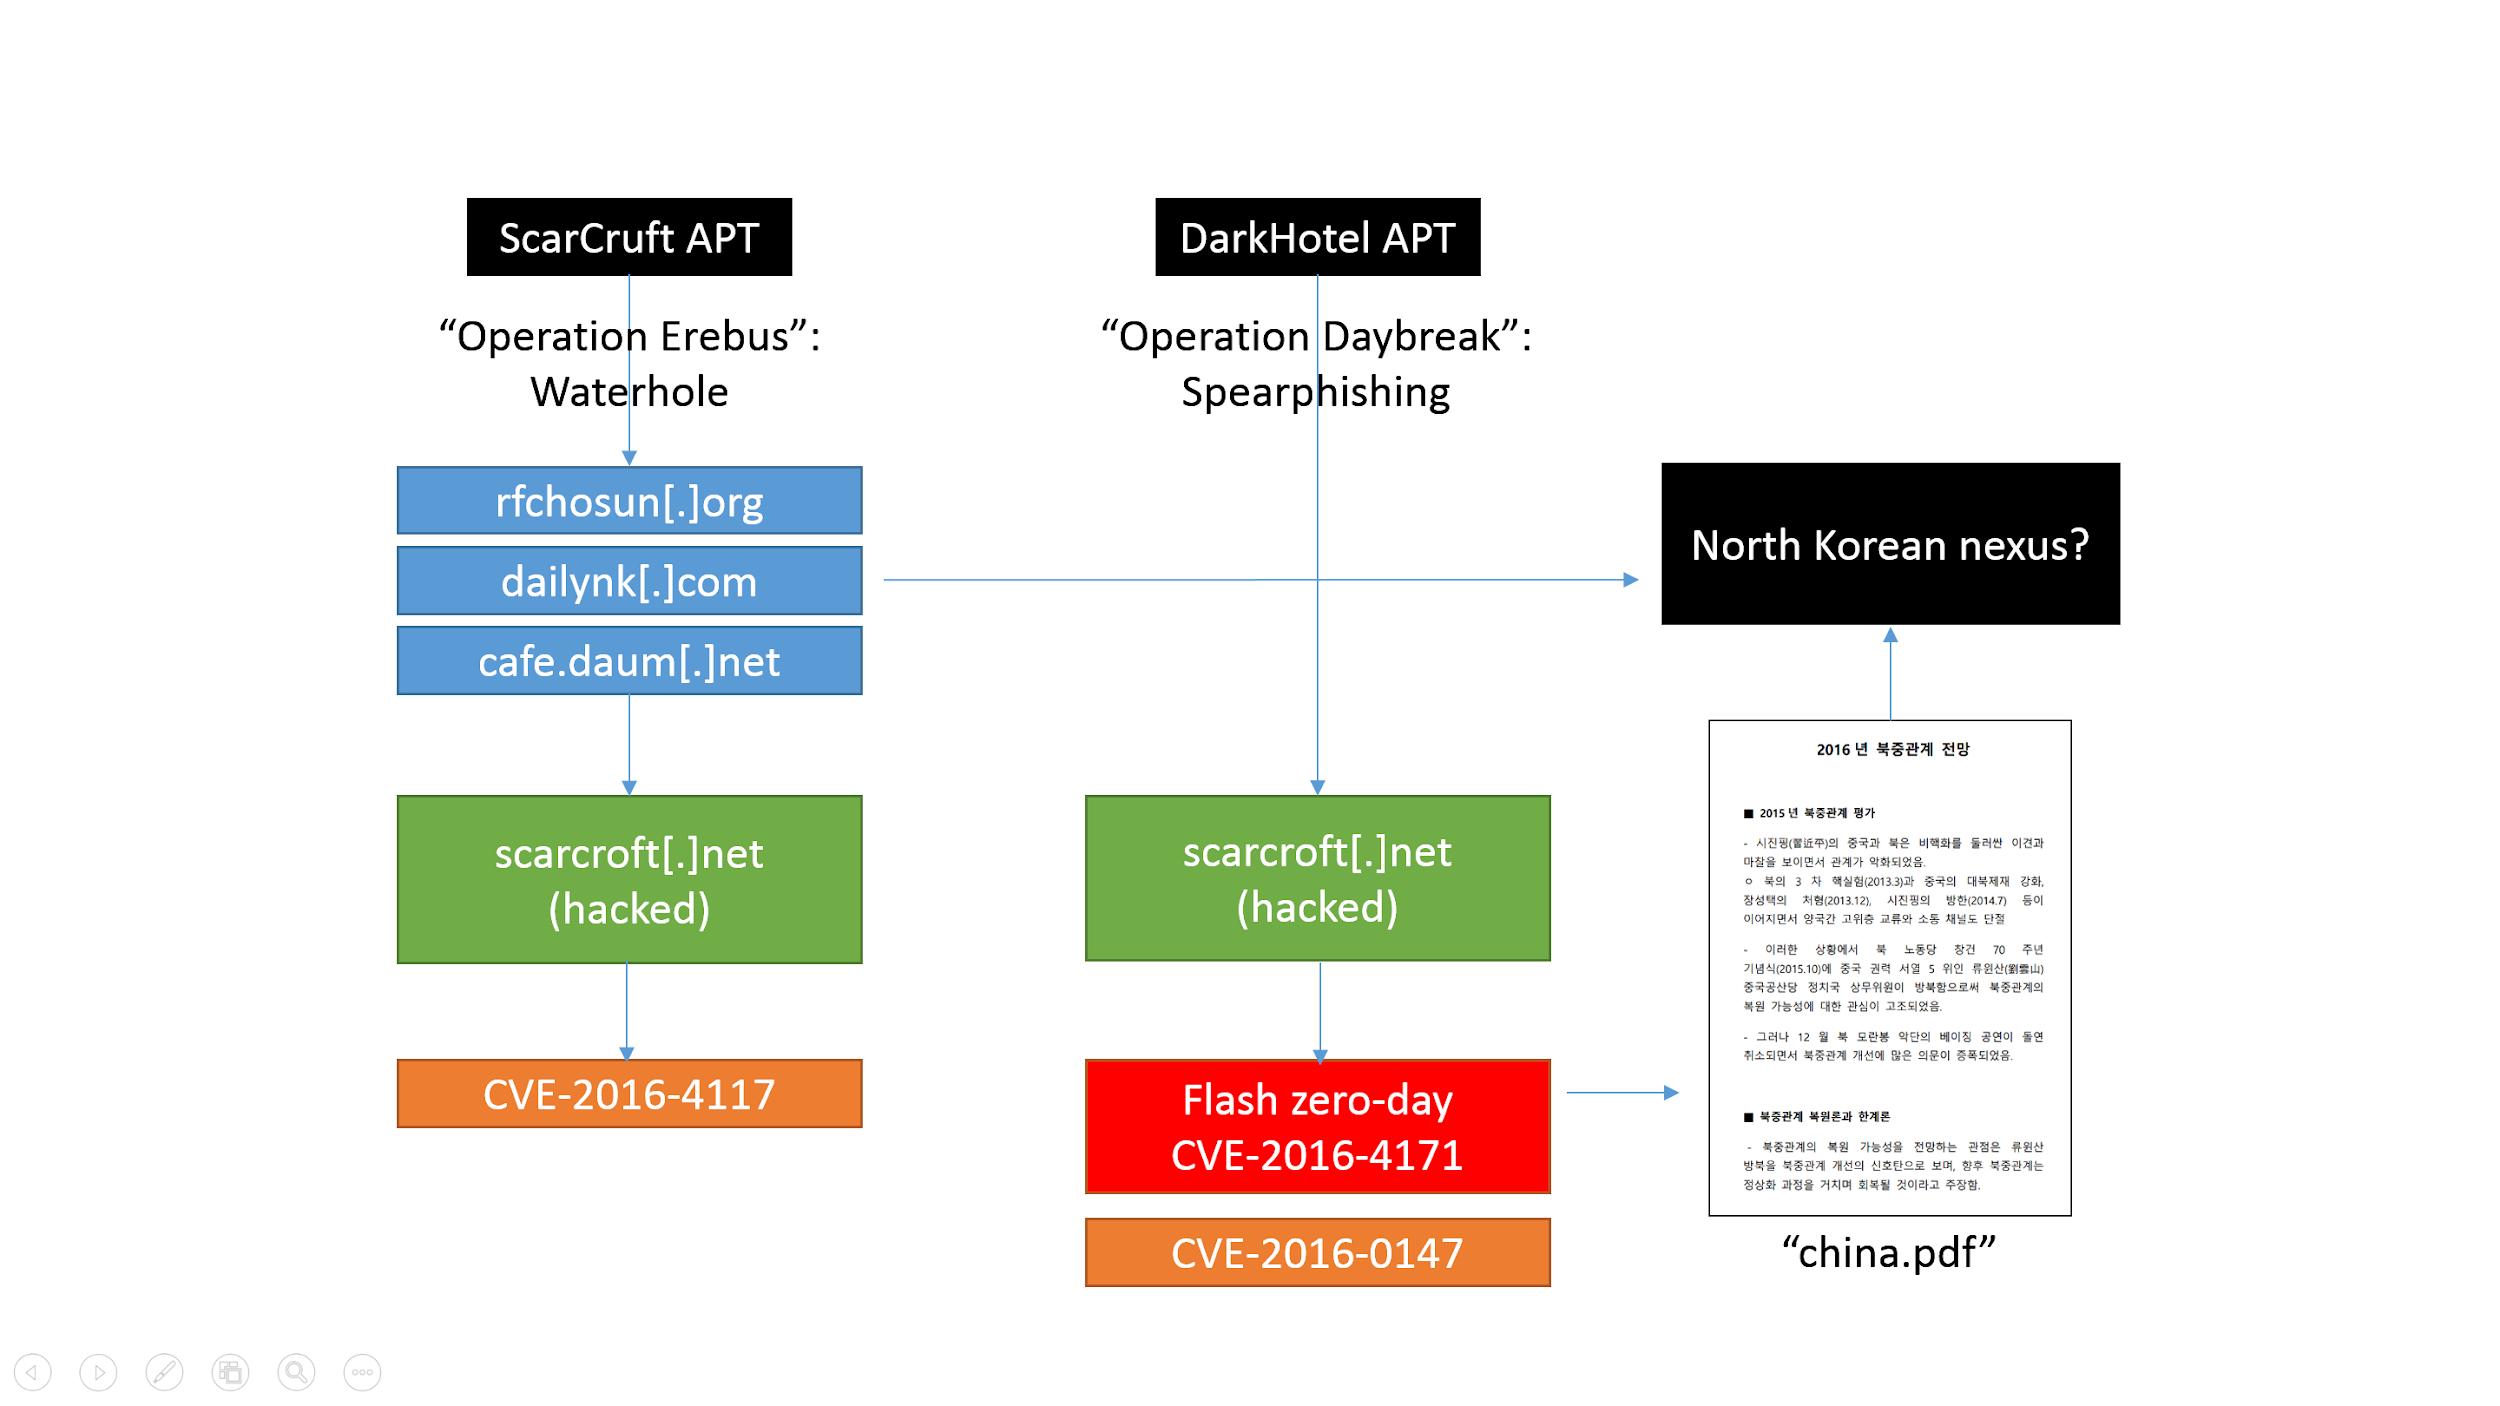 Analysis of the CVE 2018 8174 exploit used by DarkHotel revealed that the er was using URLMoniker to invoke Internet Explorer through Microsoft Word